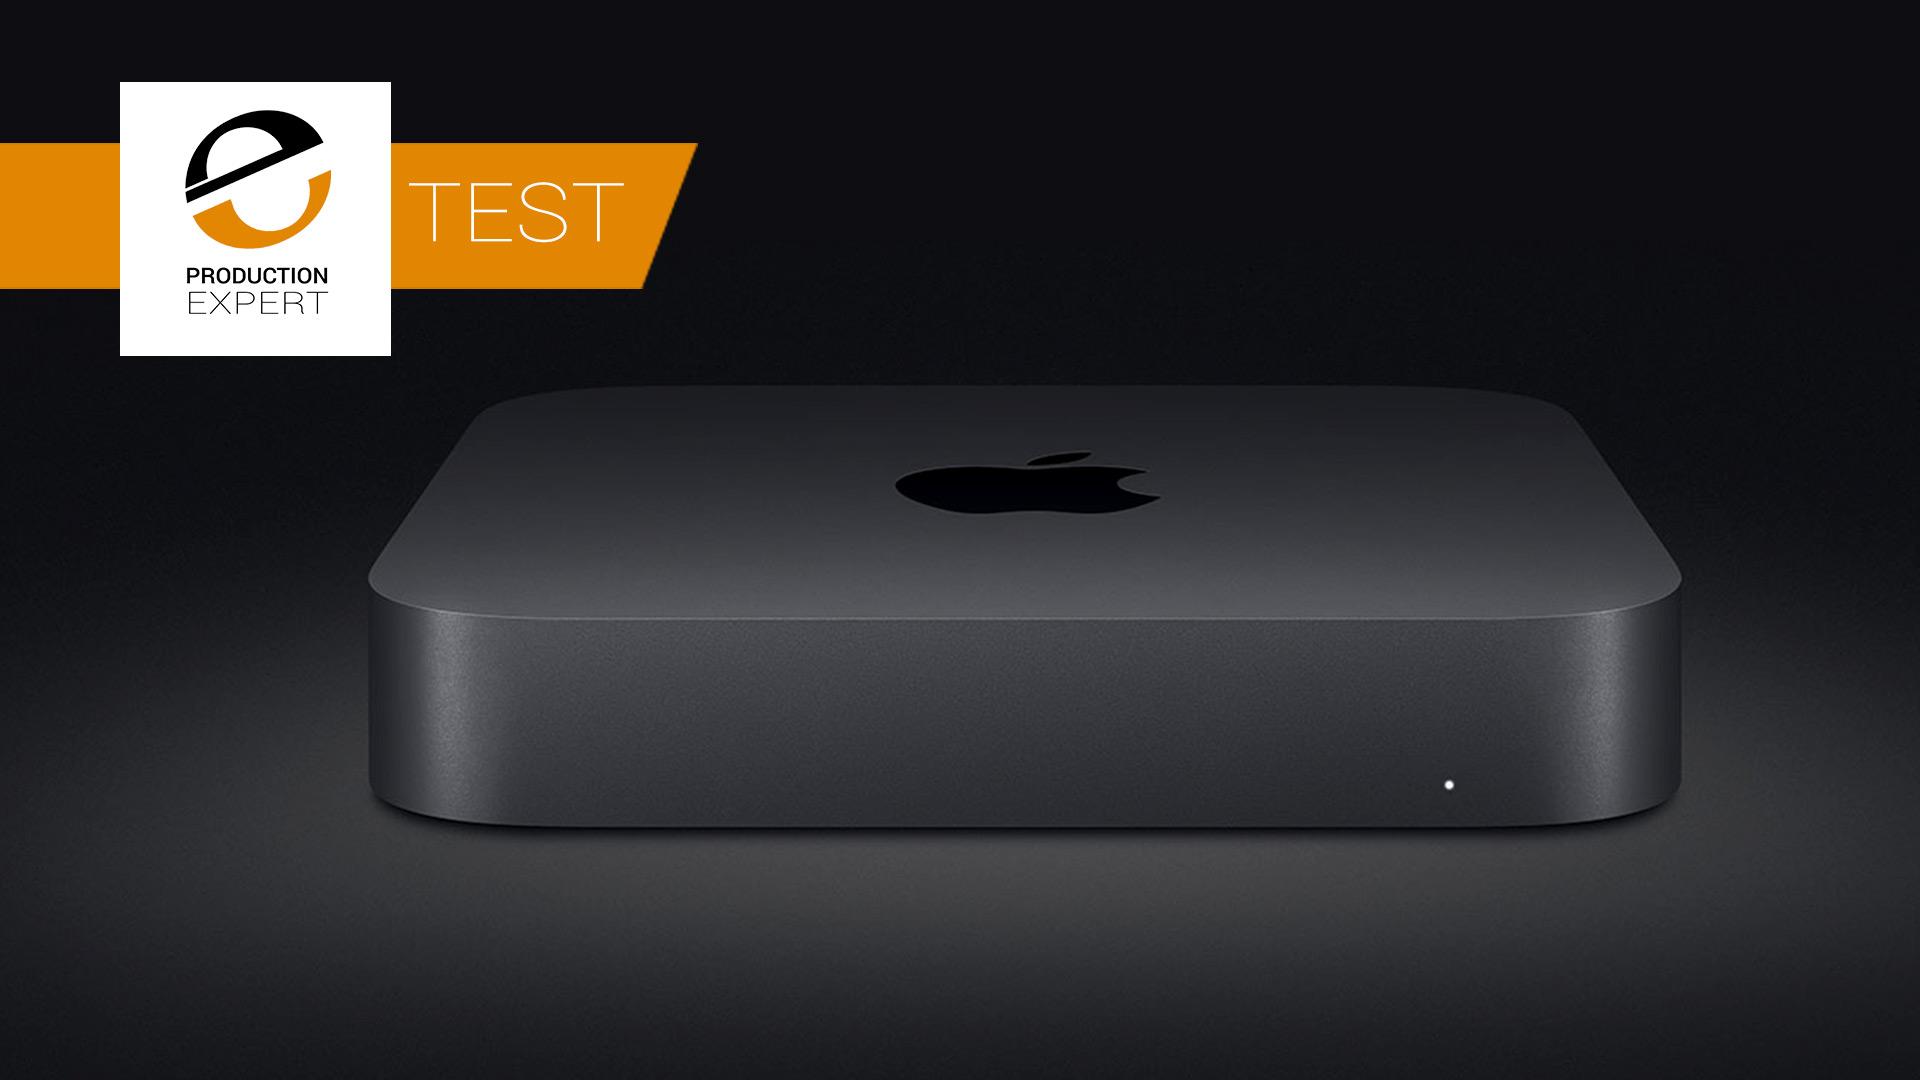 Apple-Mac-Mini-2018-Review.jpg